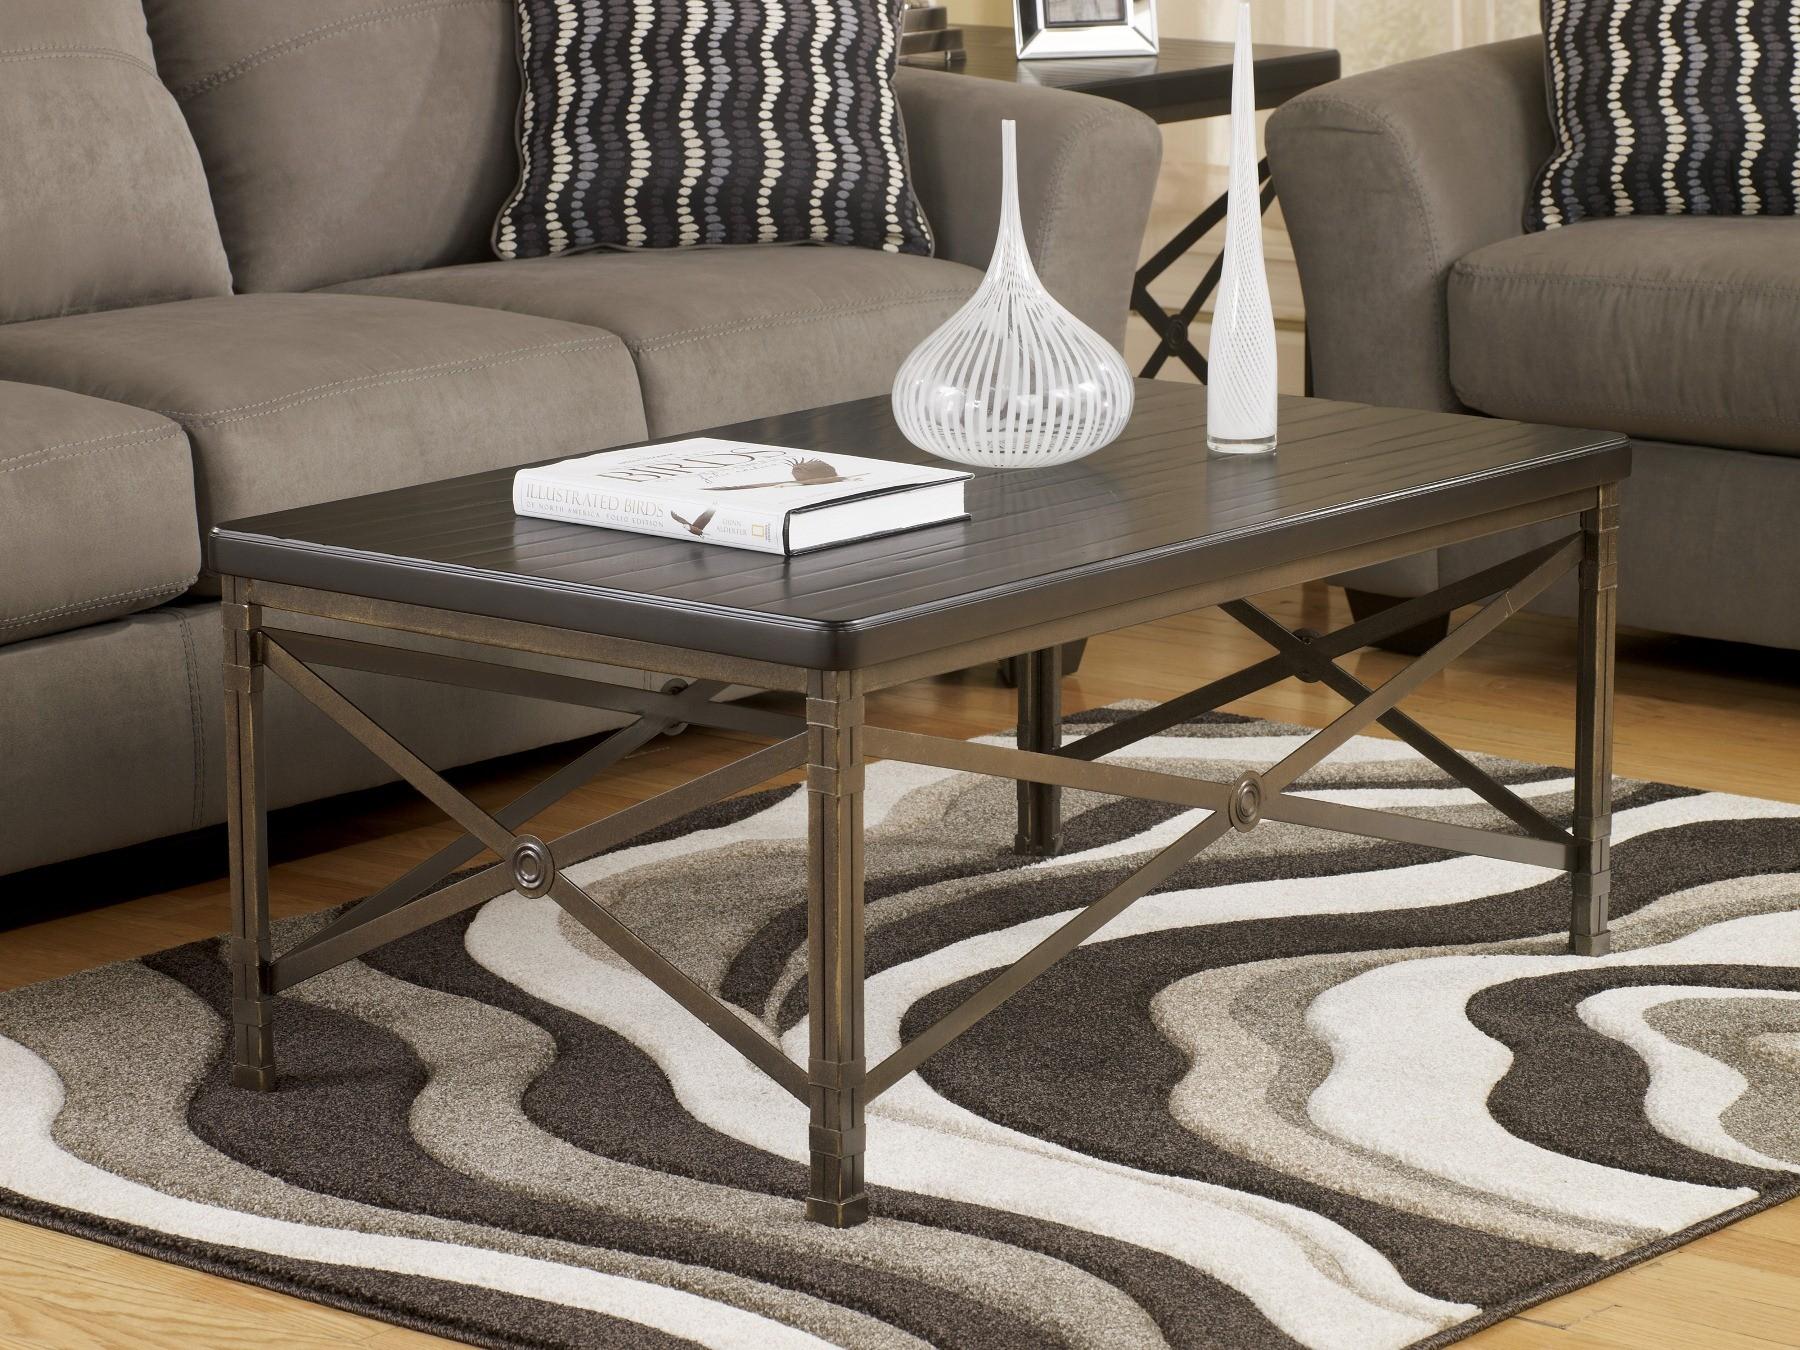 Furniture living room furniture coffee grove coffee for Kelling designs